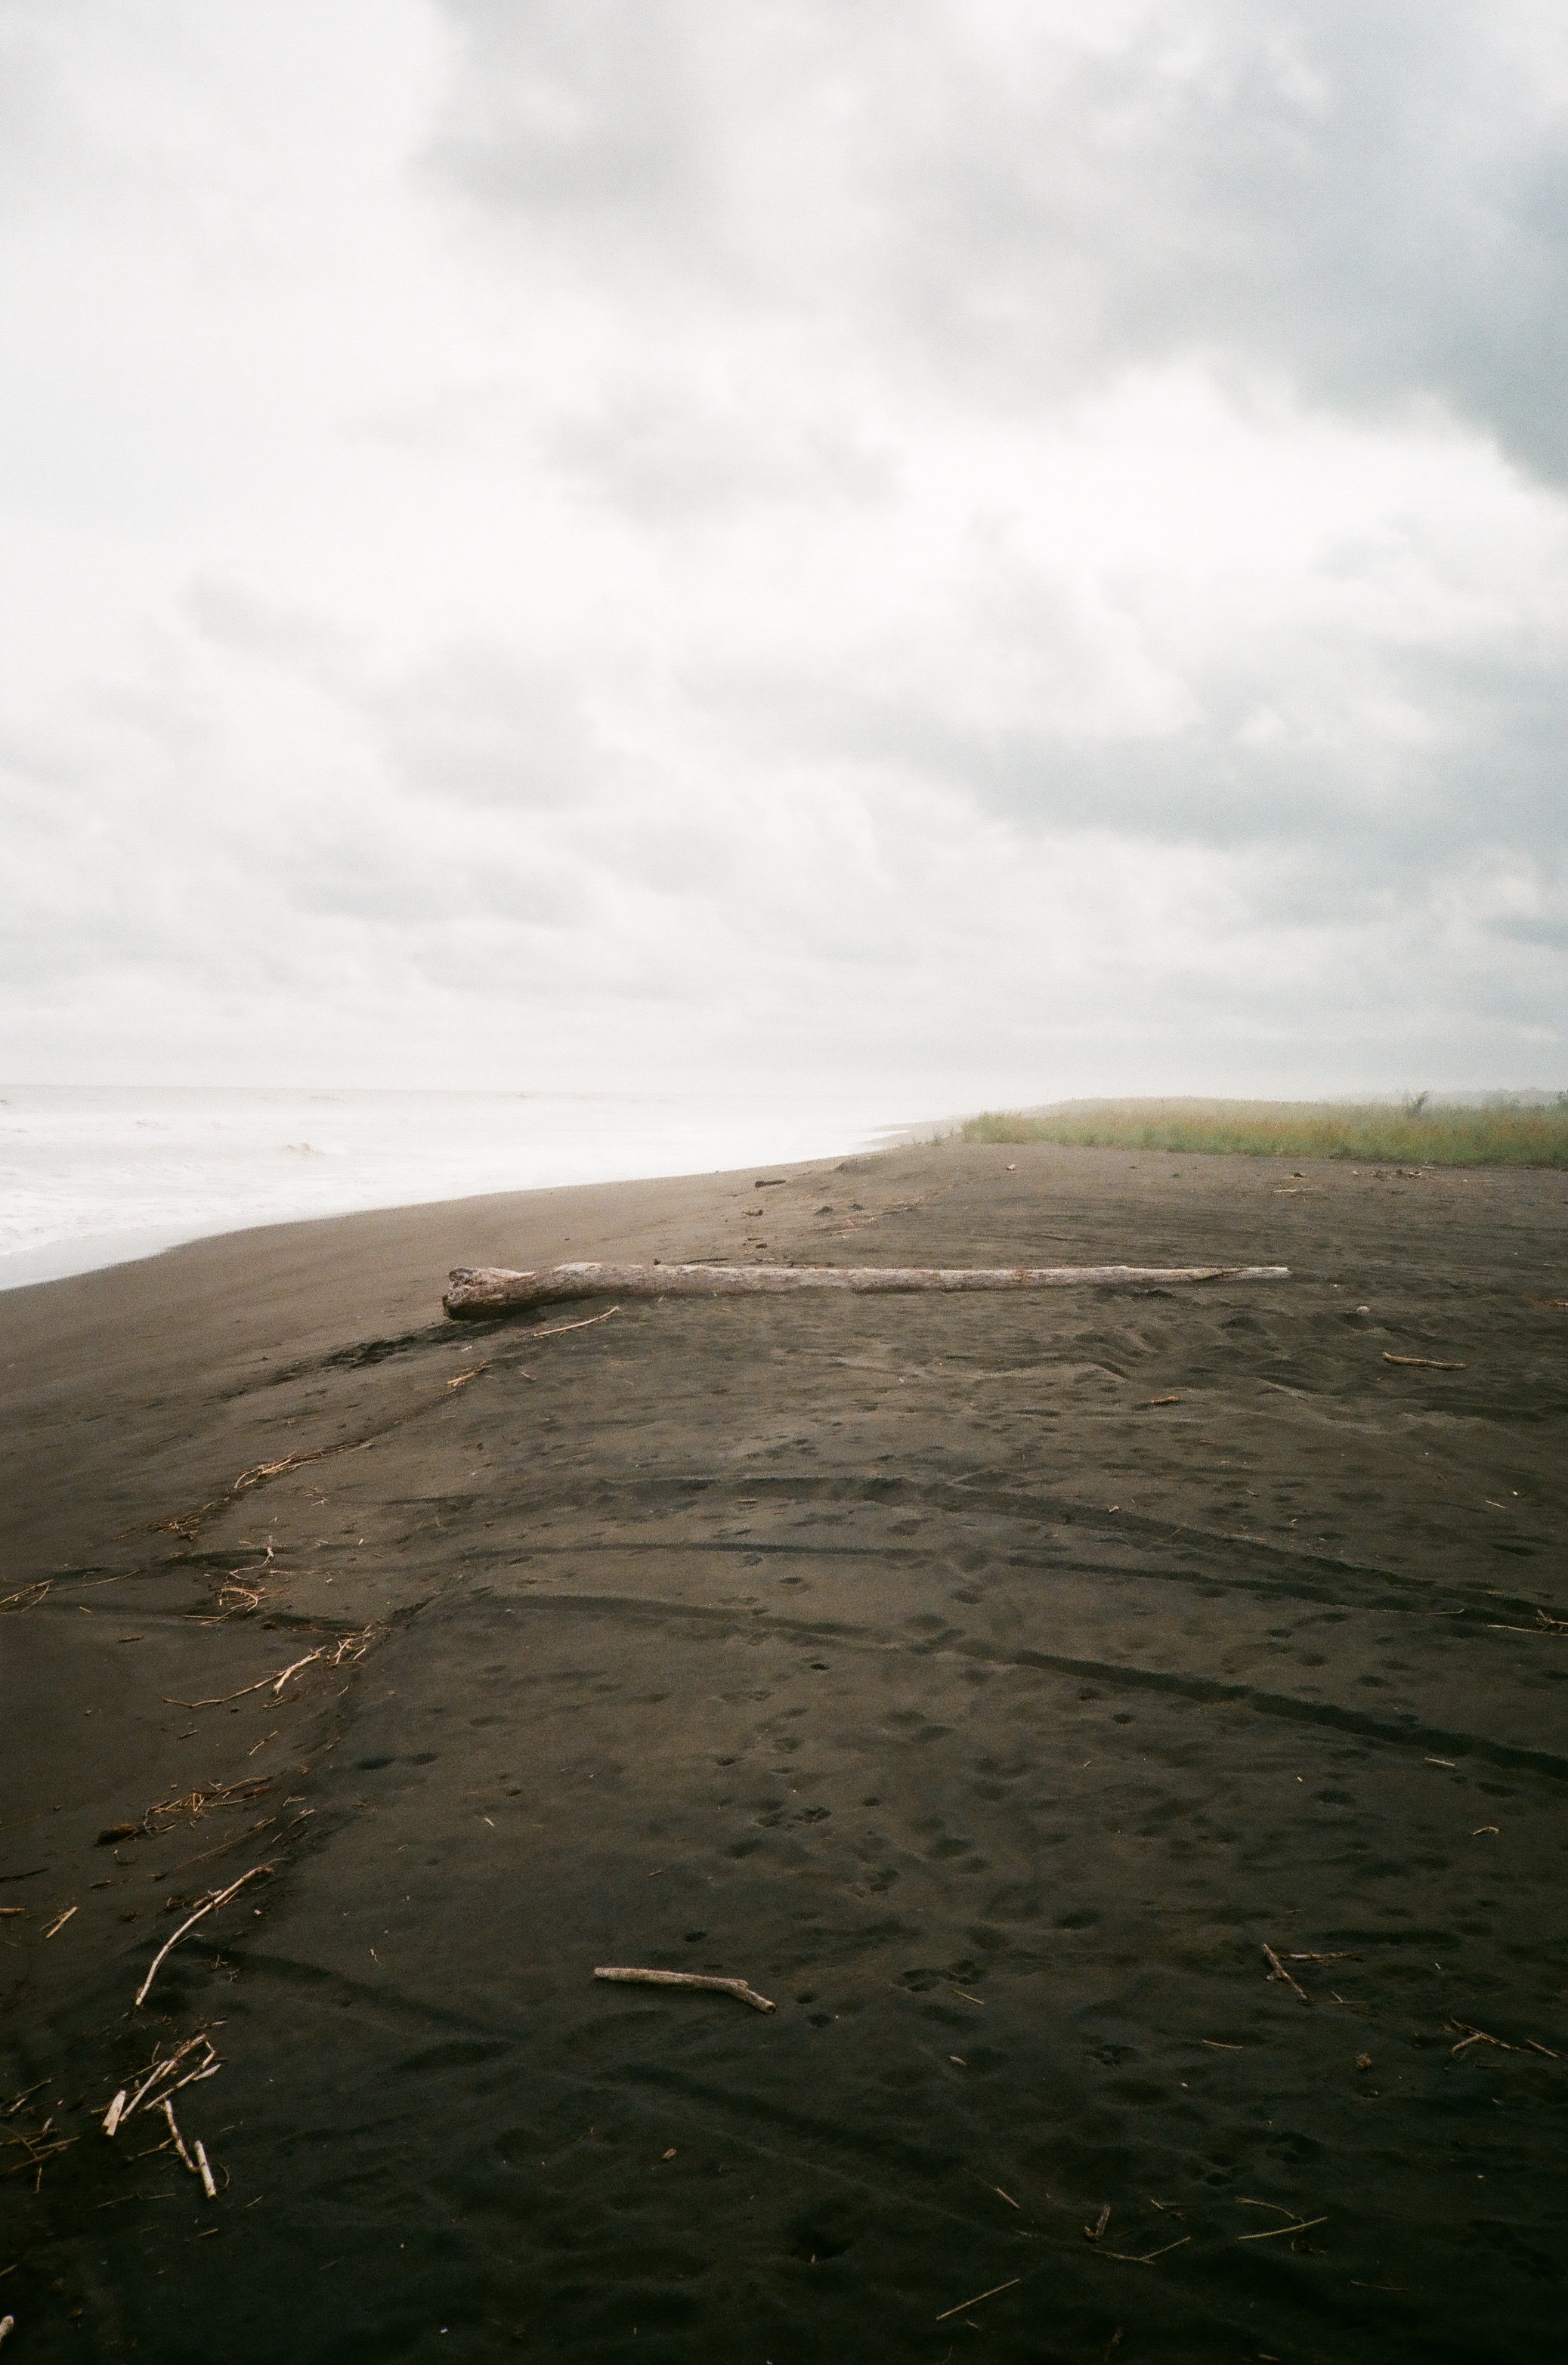 Playa Palo Seco, Puntarenas Province, Costa Rica